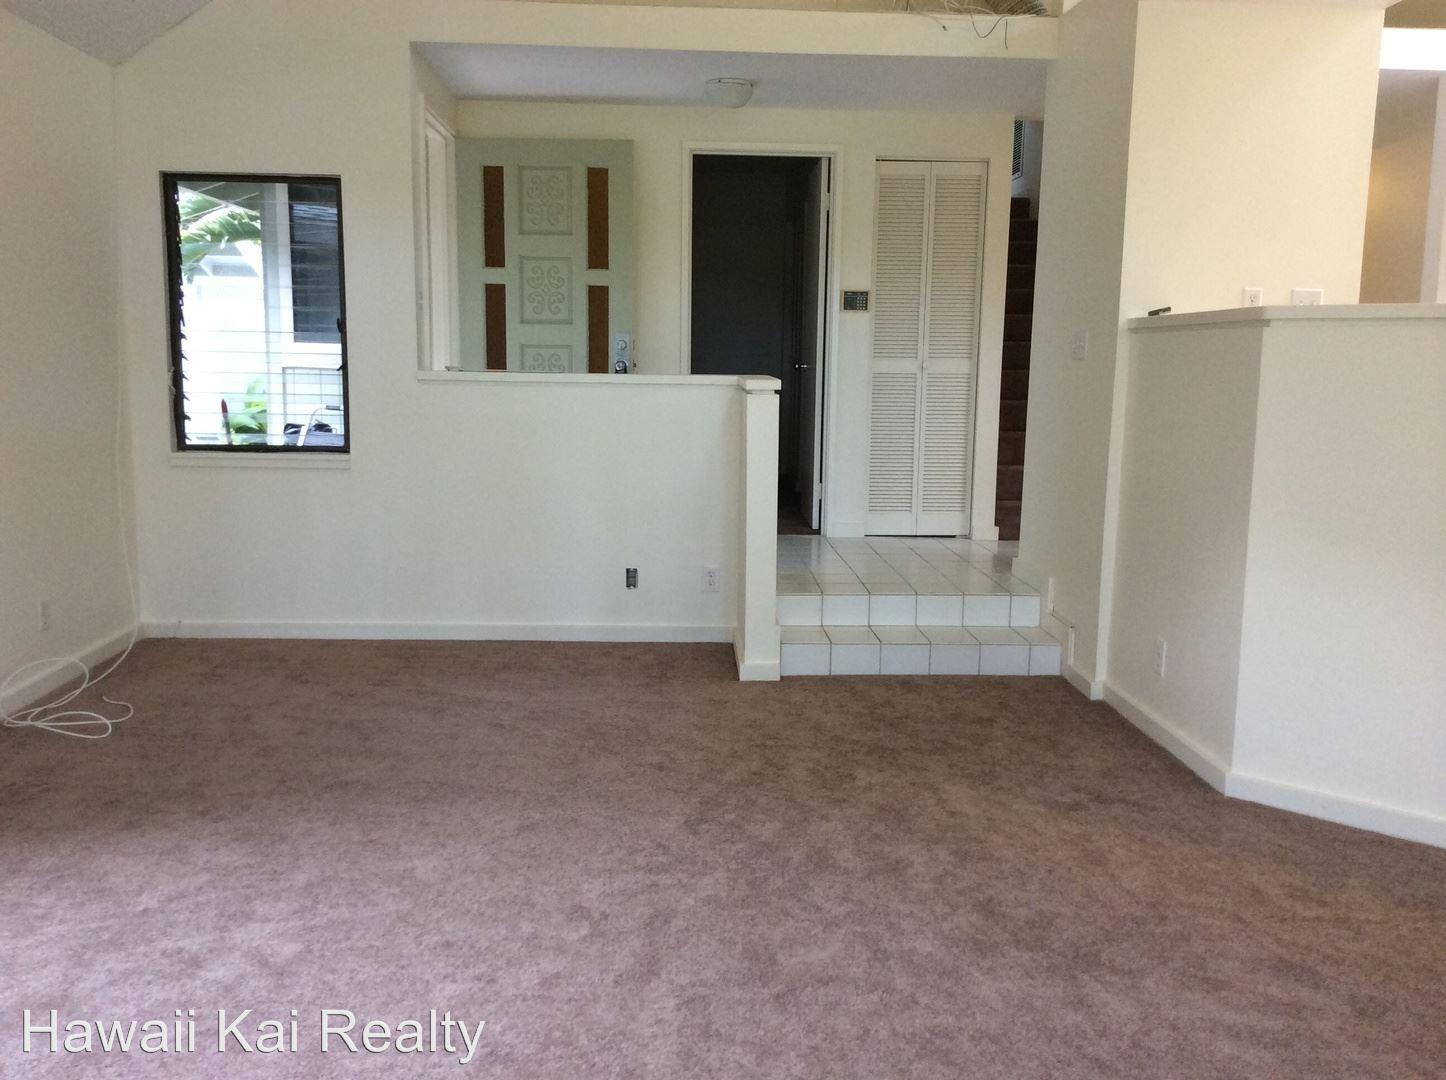 356 Kuanalu Pl Honolulu Hi 96825 3 Bedroom Apartment For Rent Padmapper